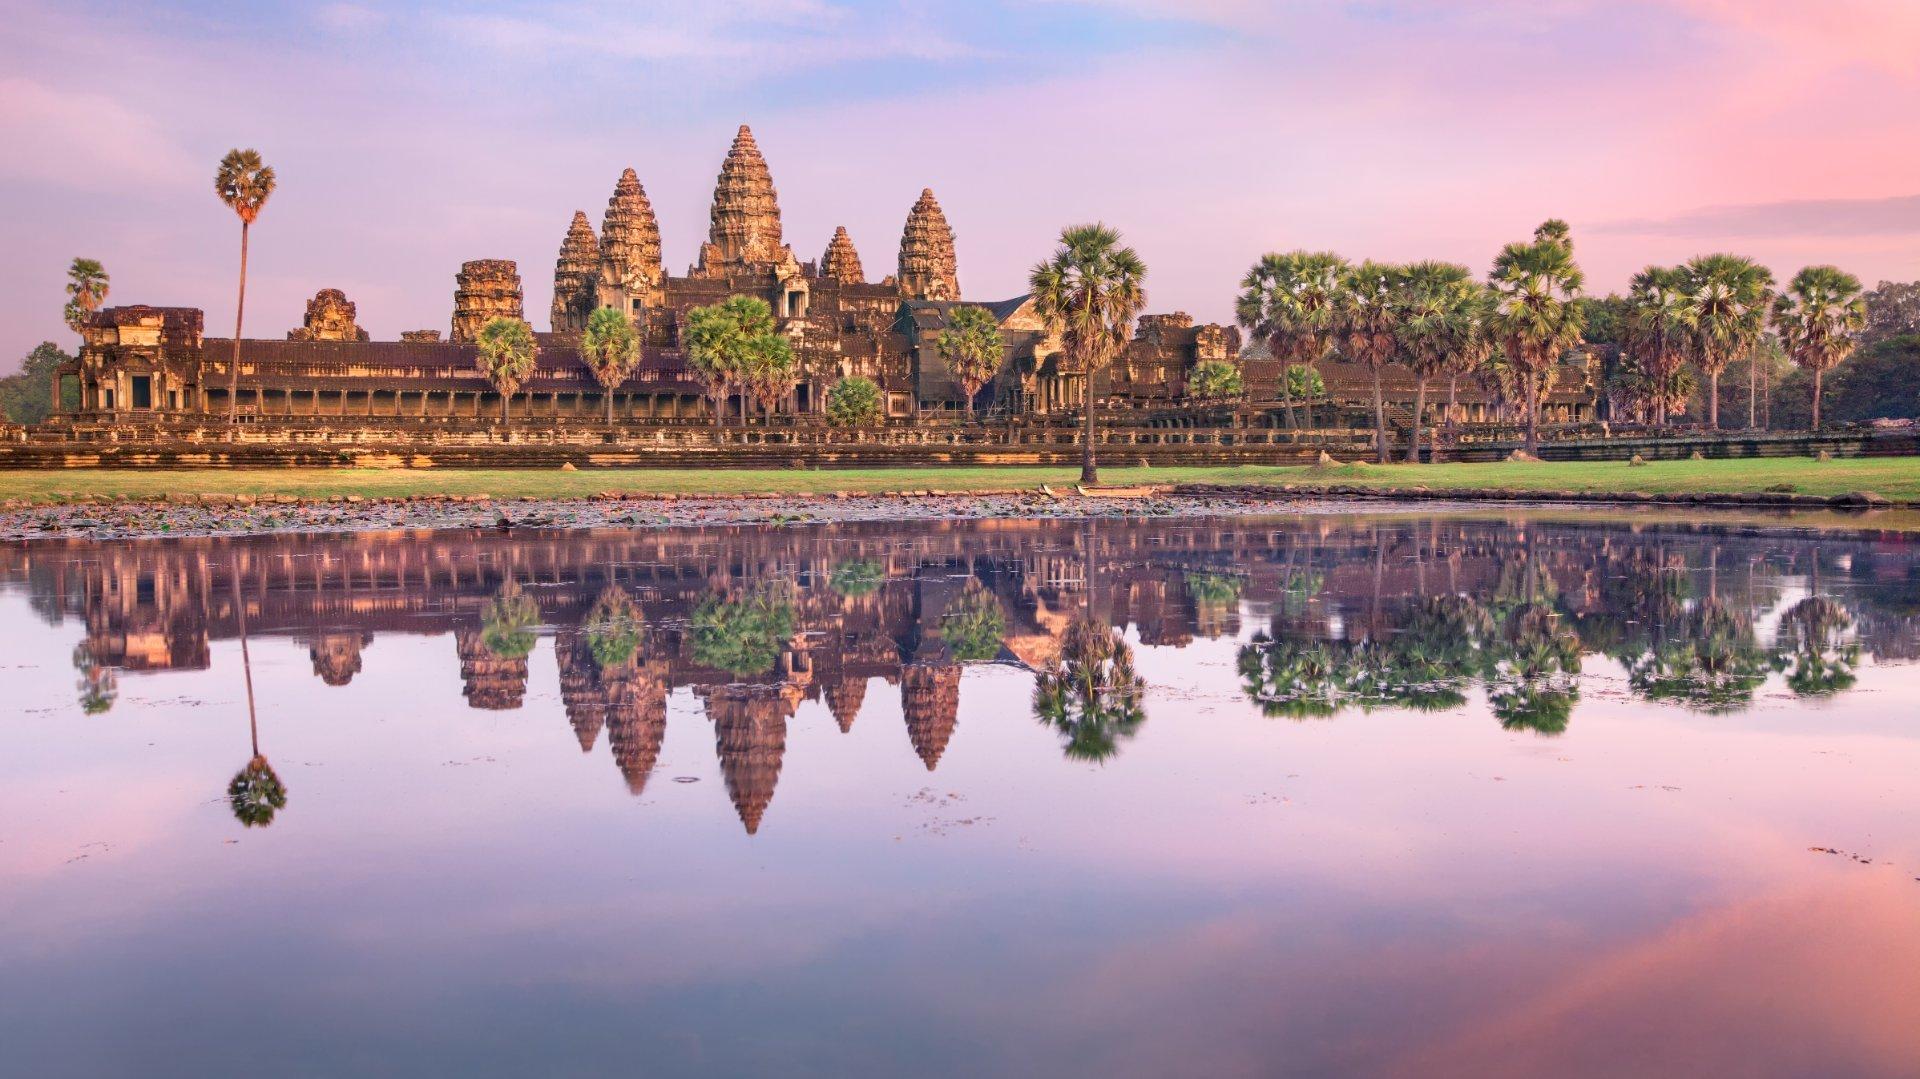 TAILANDIA IMPRESCINDIBLE CON ANGKOR y PHUKET